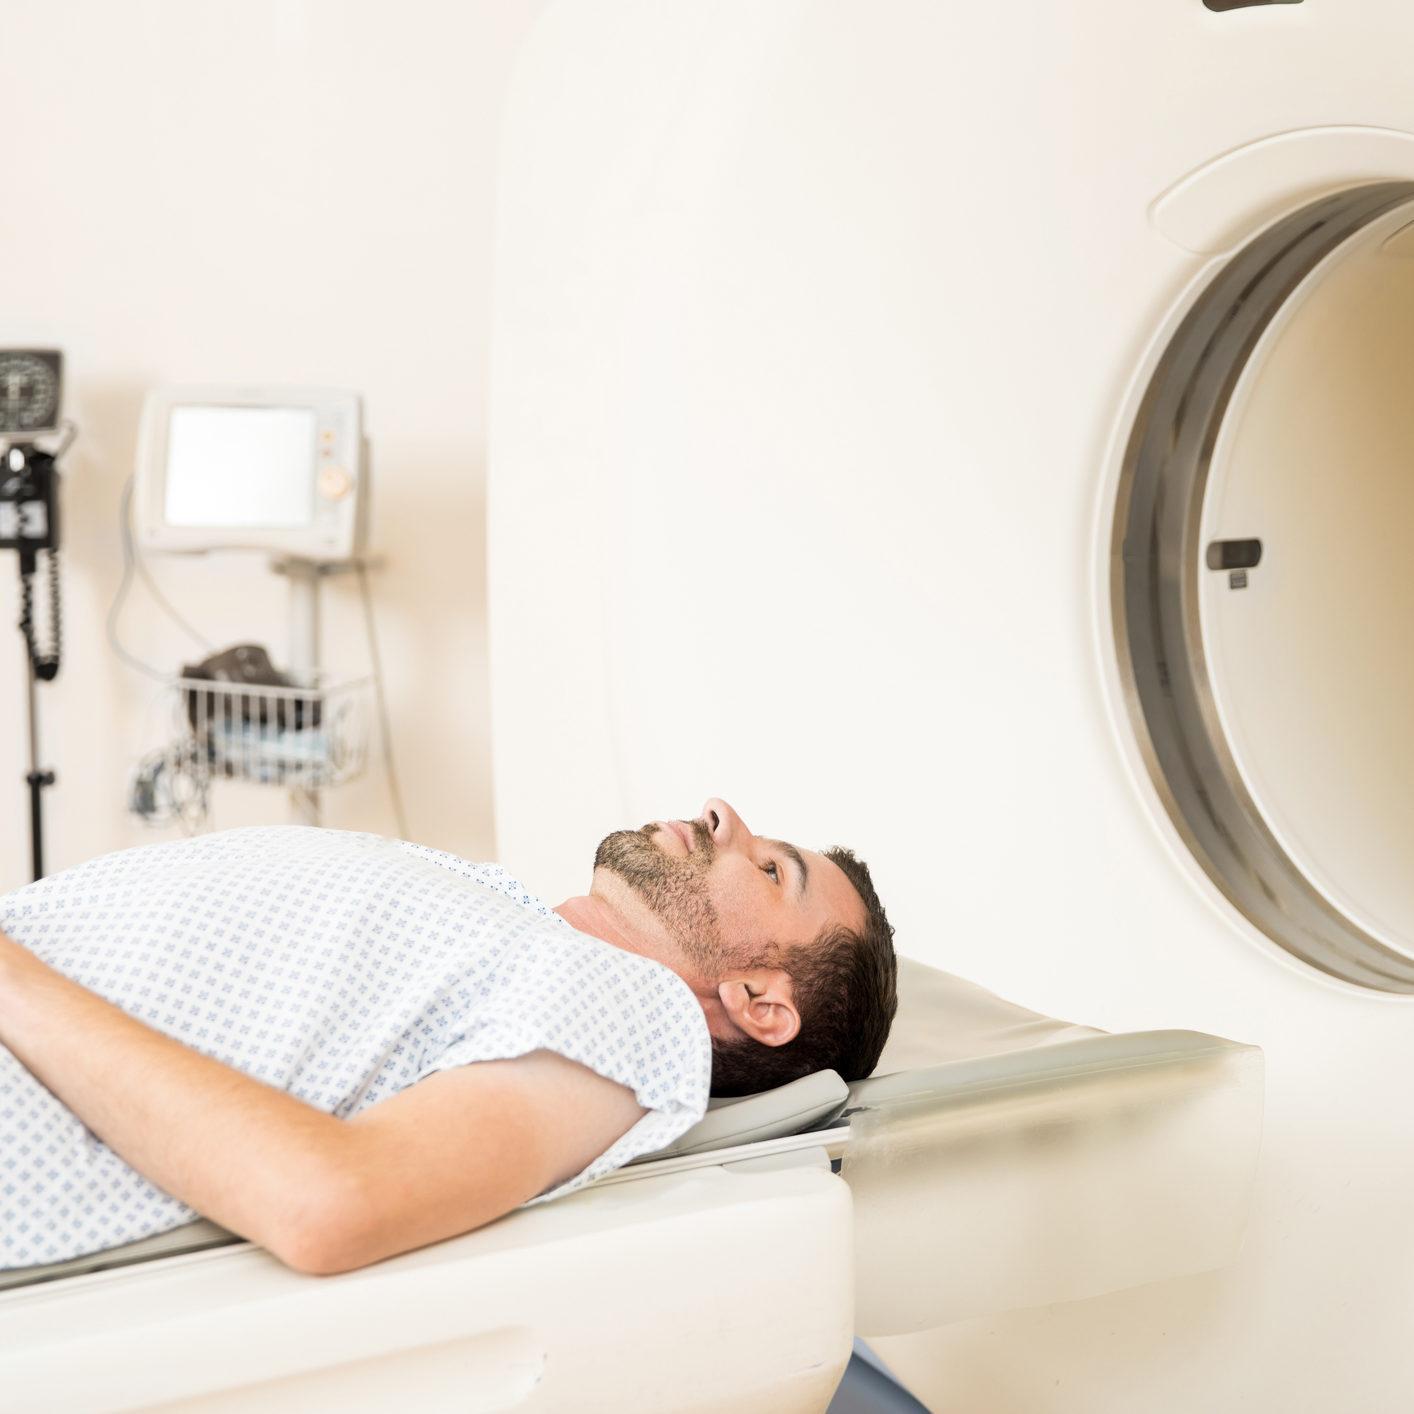 OZ Radiology – Wilbur Imaging Partners, Inc